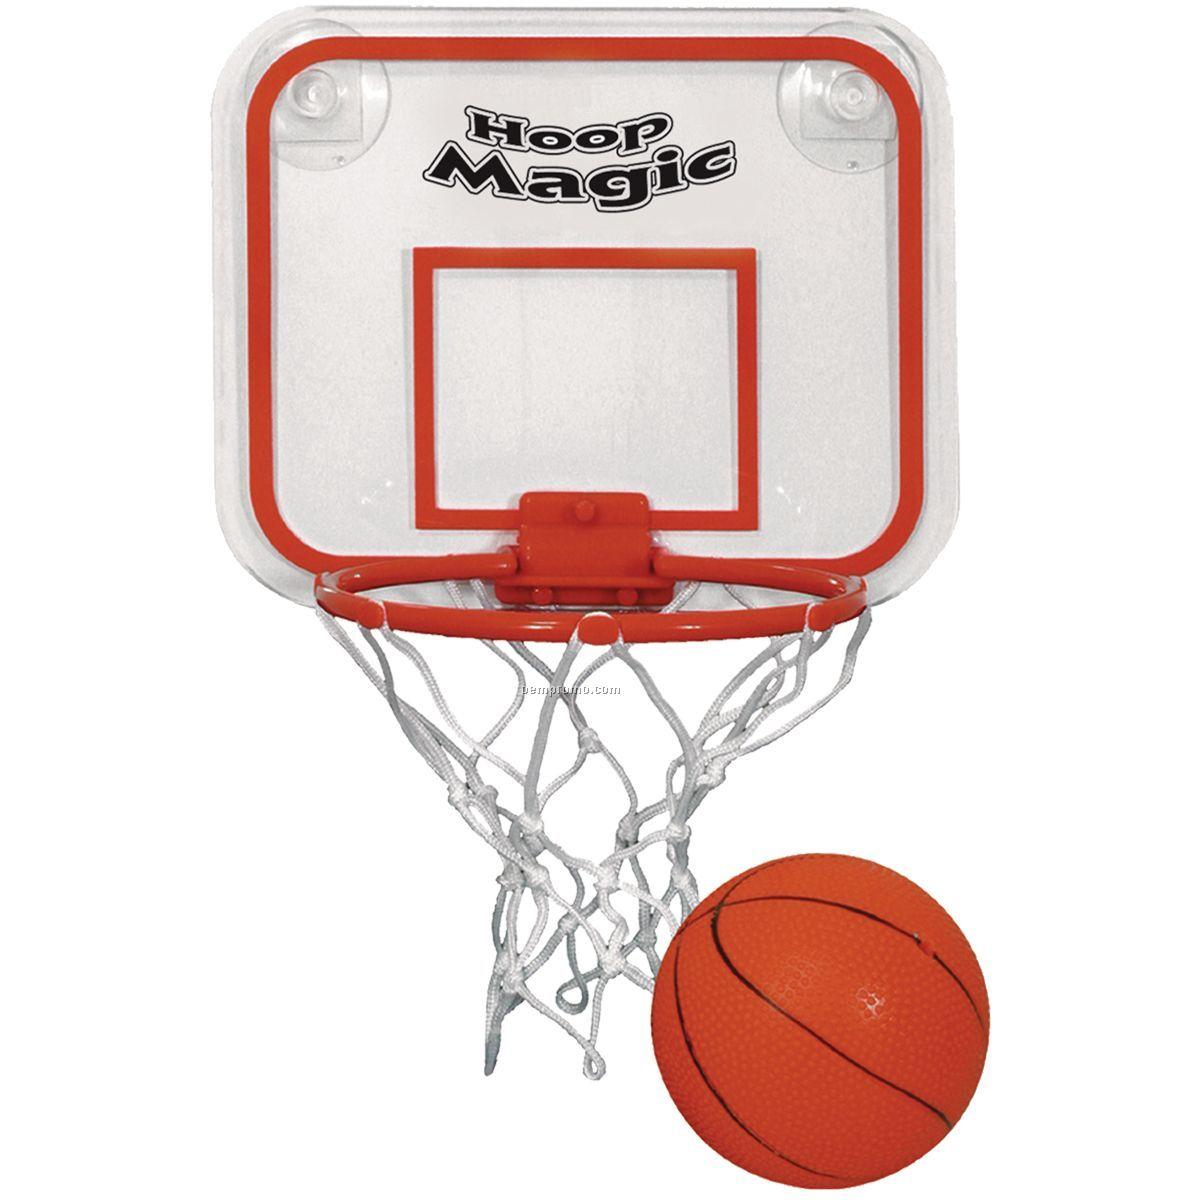 Coupon for basketball hoop